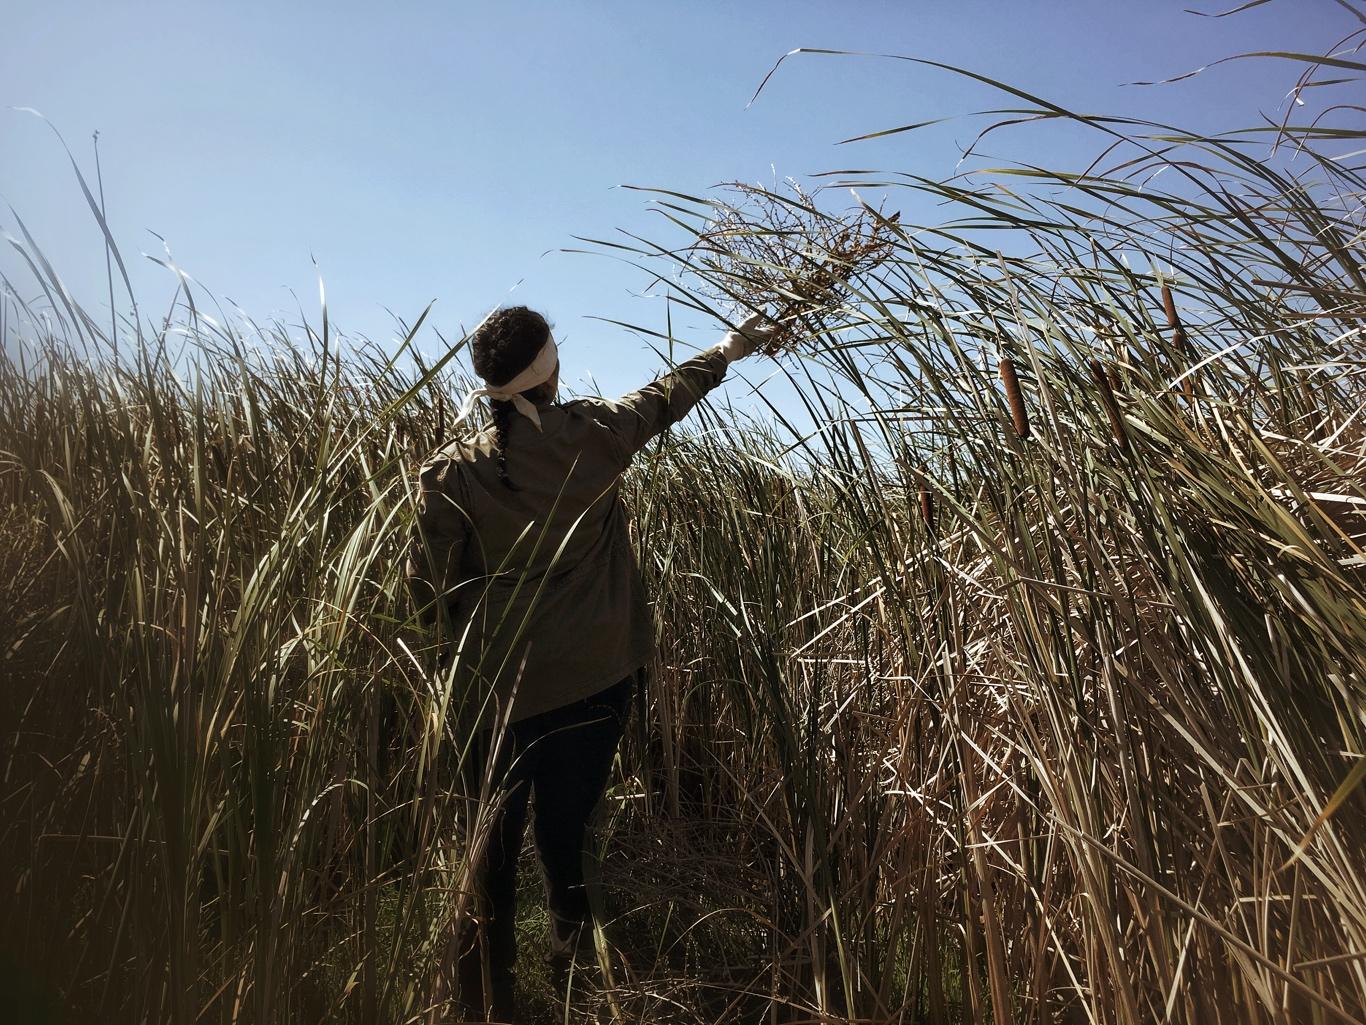 Casting Aside the Tumbleweeds